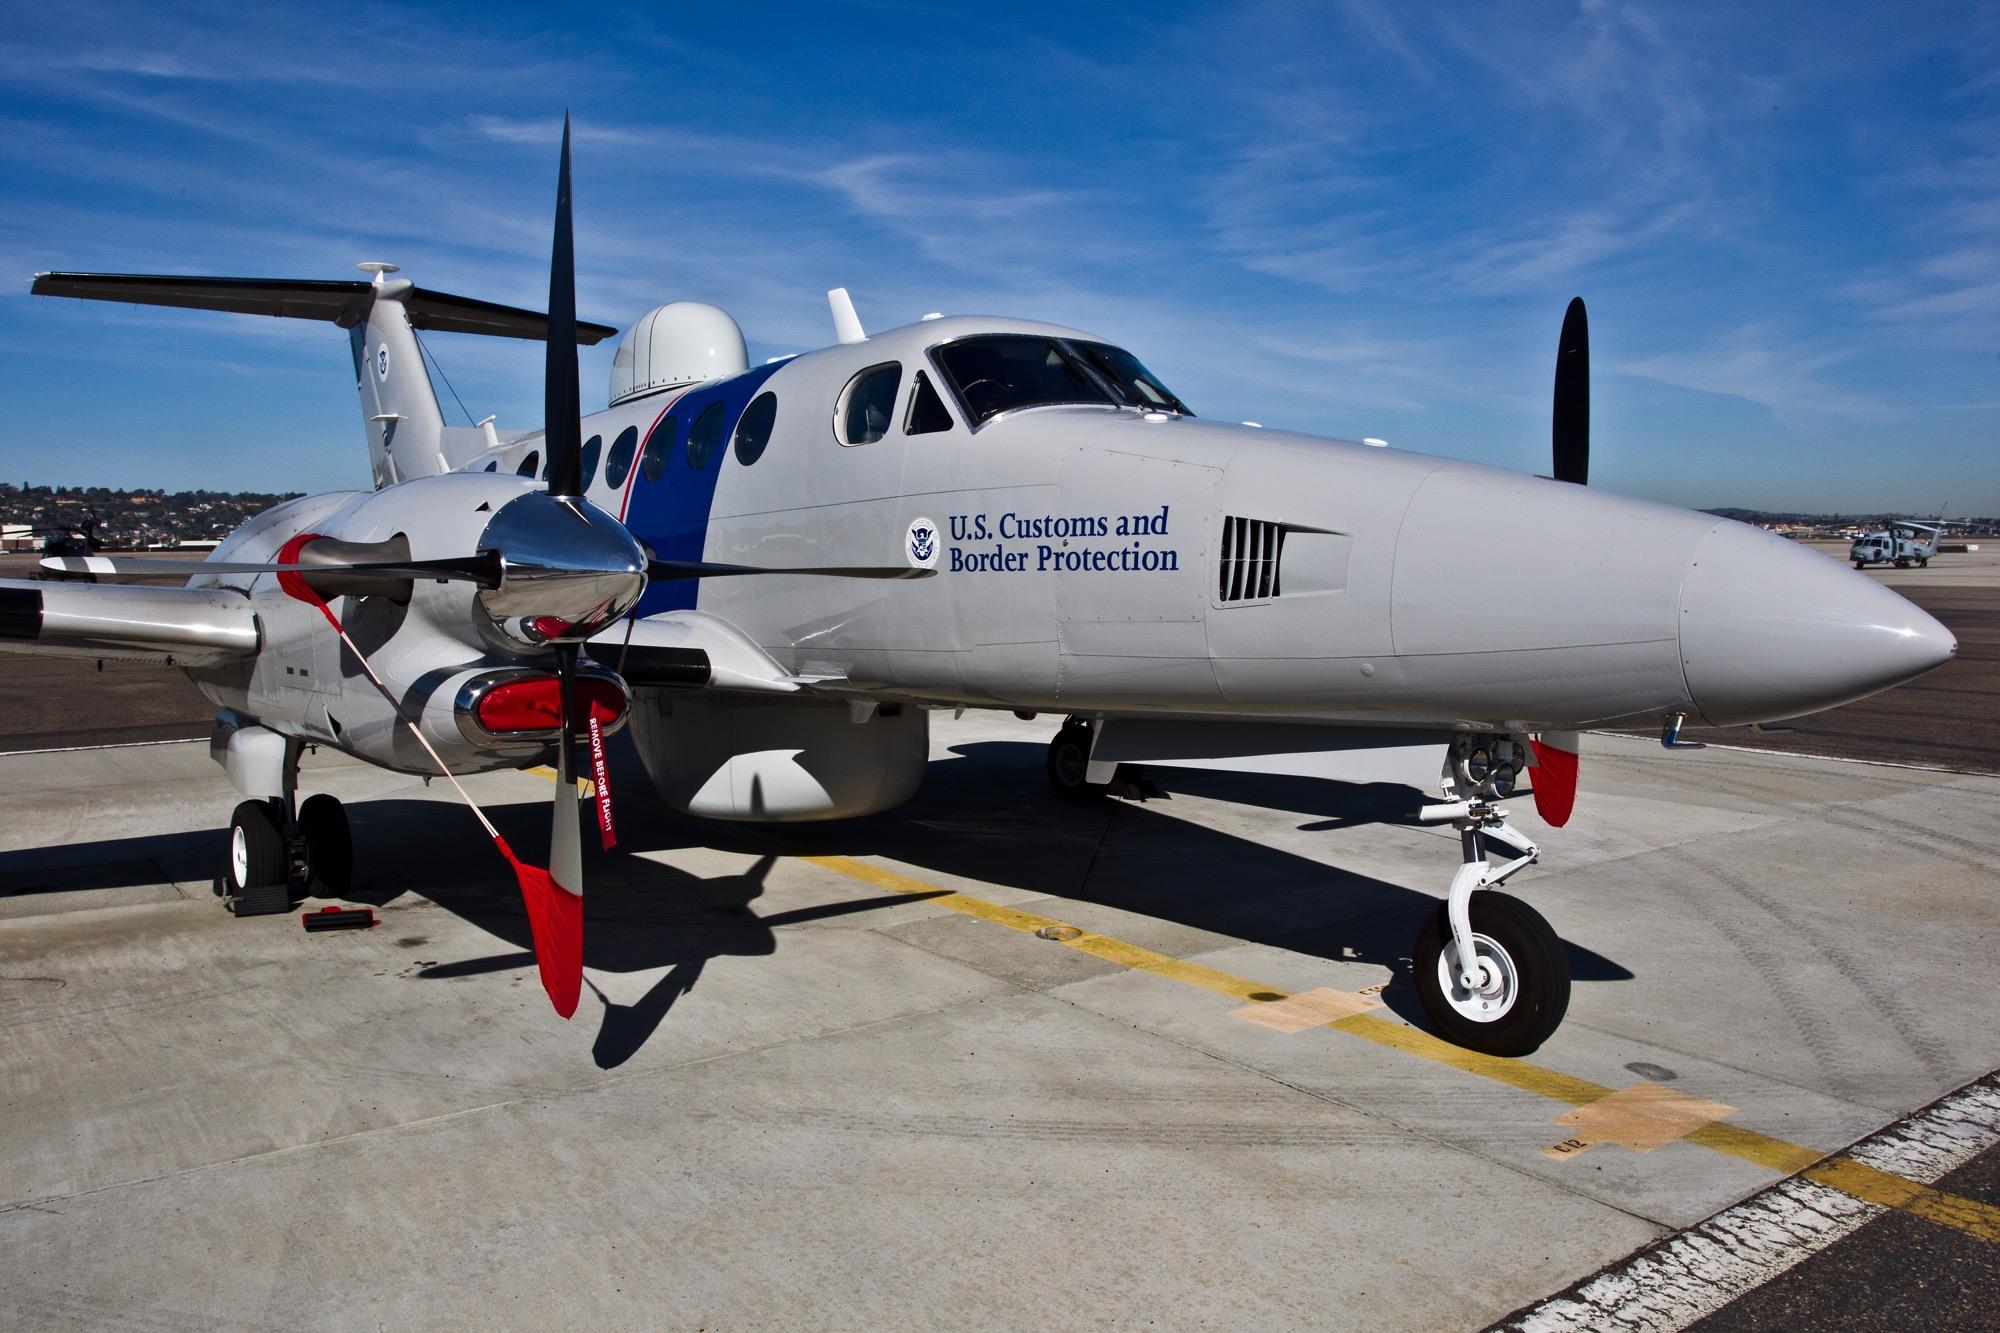 FDA、7月から山形/新千歳線を運航再開 名古屋発着で便数を追加